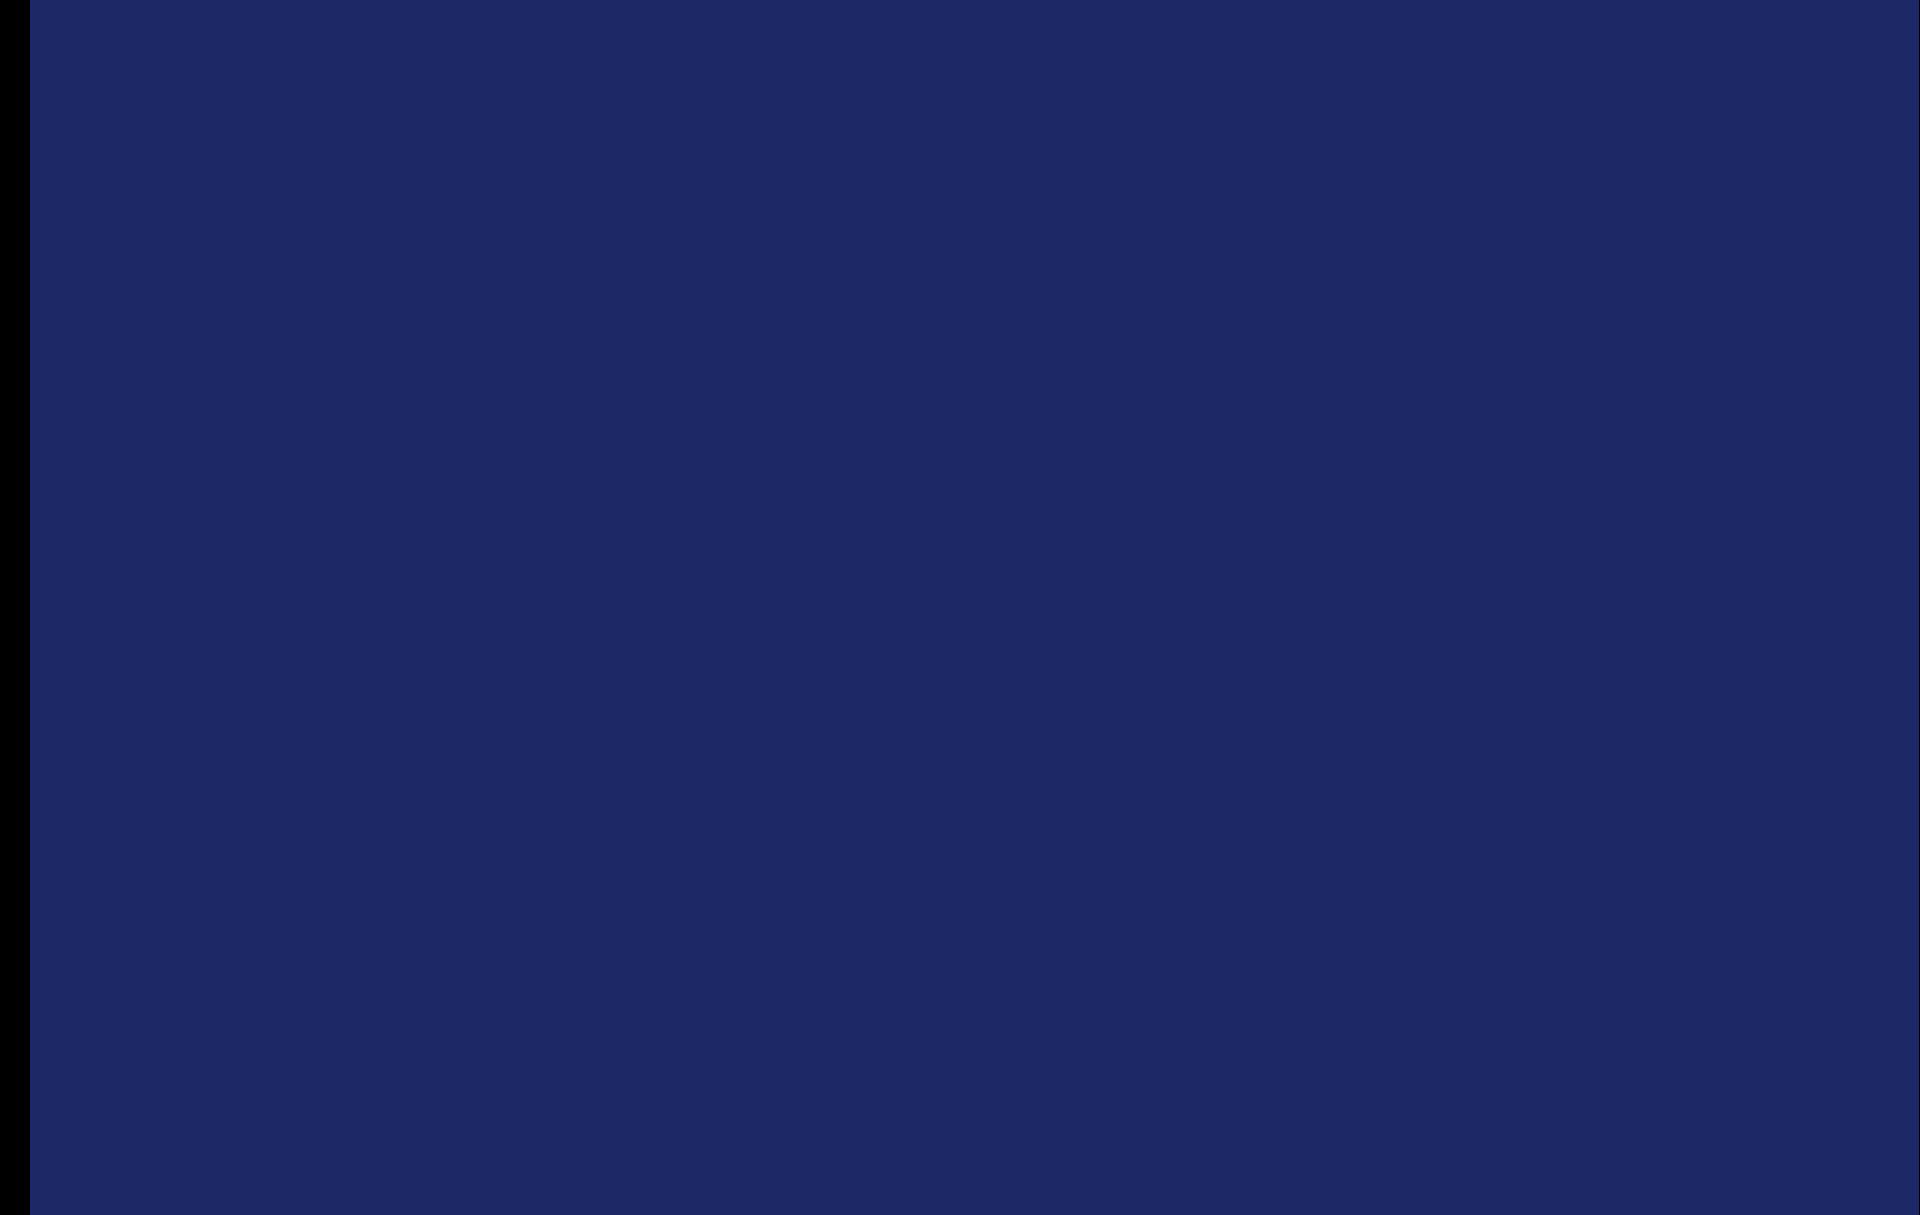 Association of Energy Engineers (AEE) Alberta Chapter